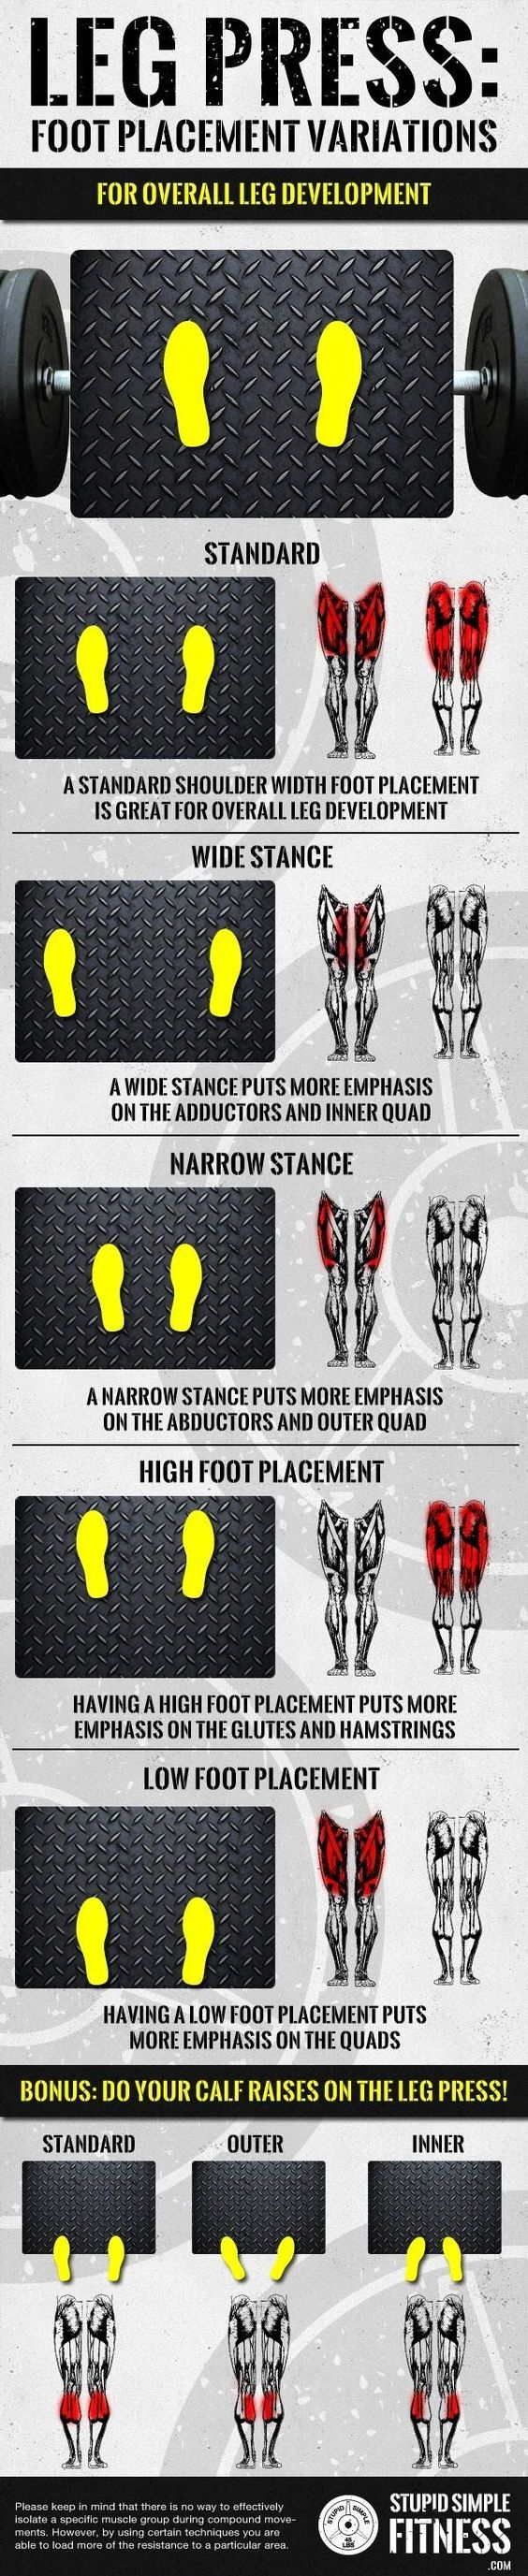 Finally learn how to Finally learn how to use the leg press machine to target all different muscles. https://www.pinterest.com/pin/51228514488758145/